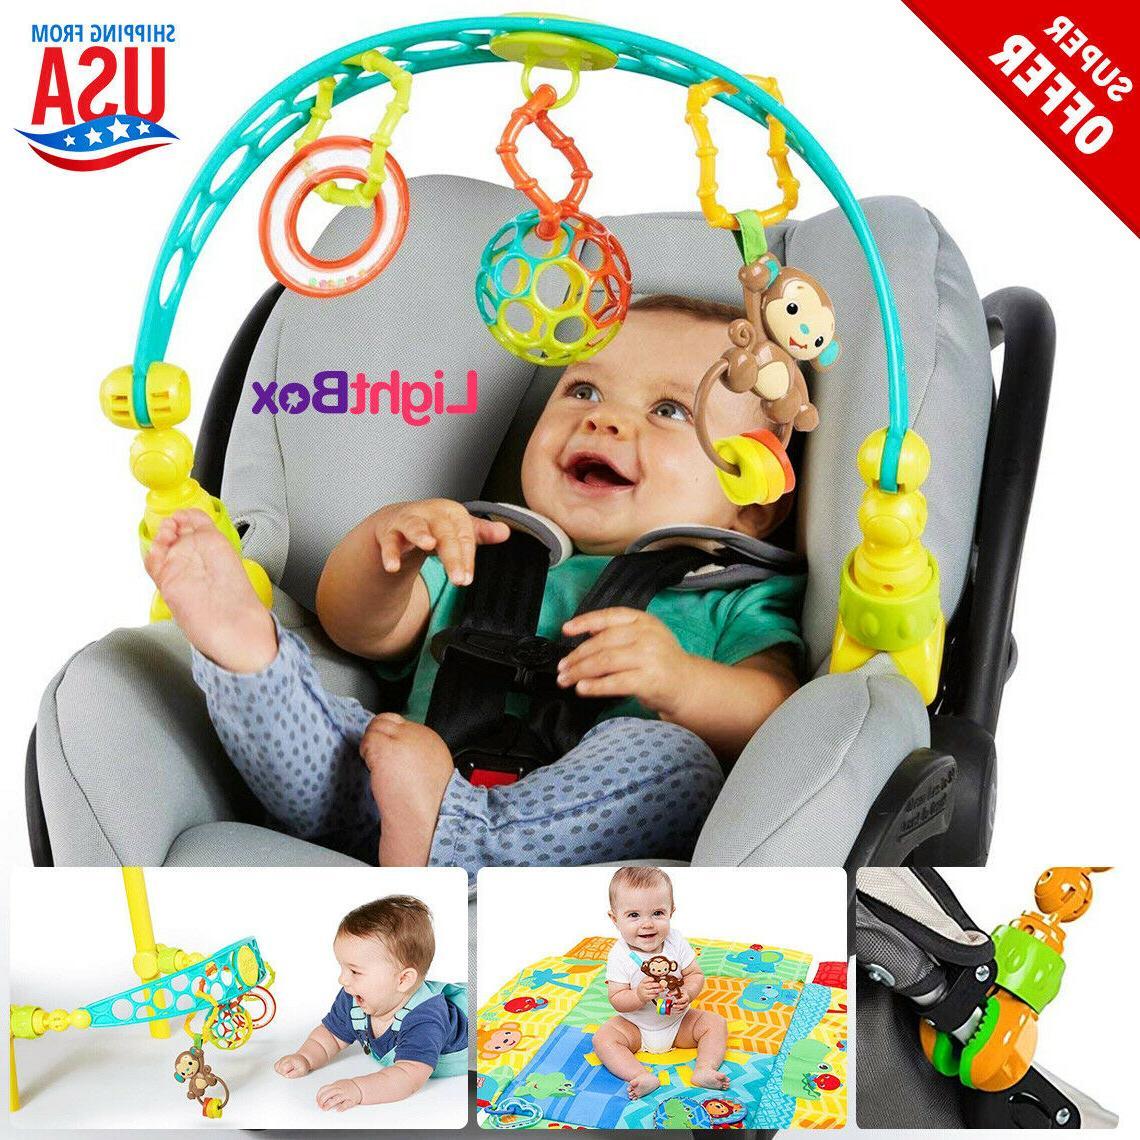 Toy Crib Activity Travel Rock Play NEW